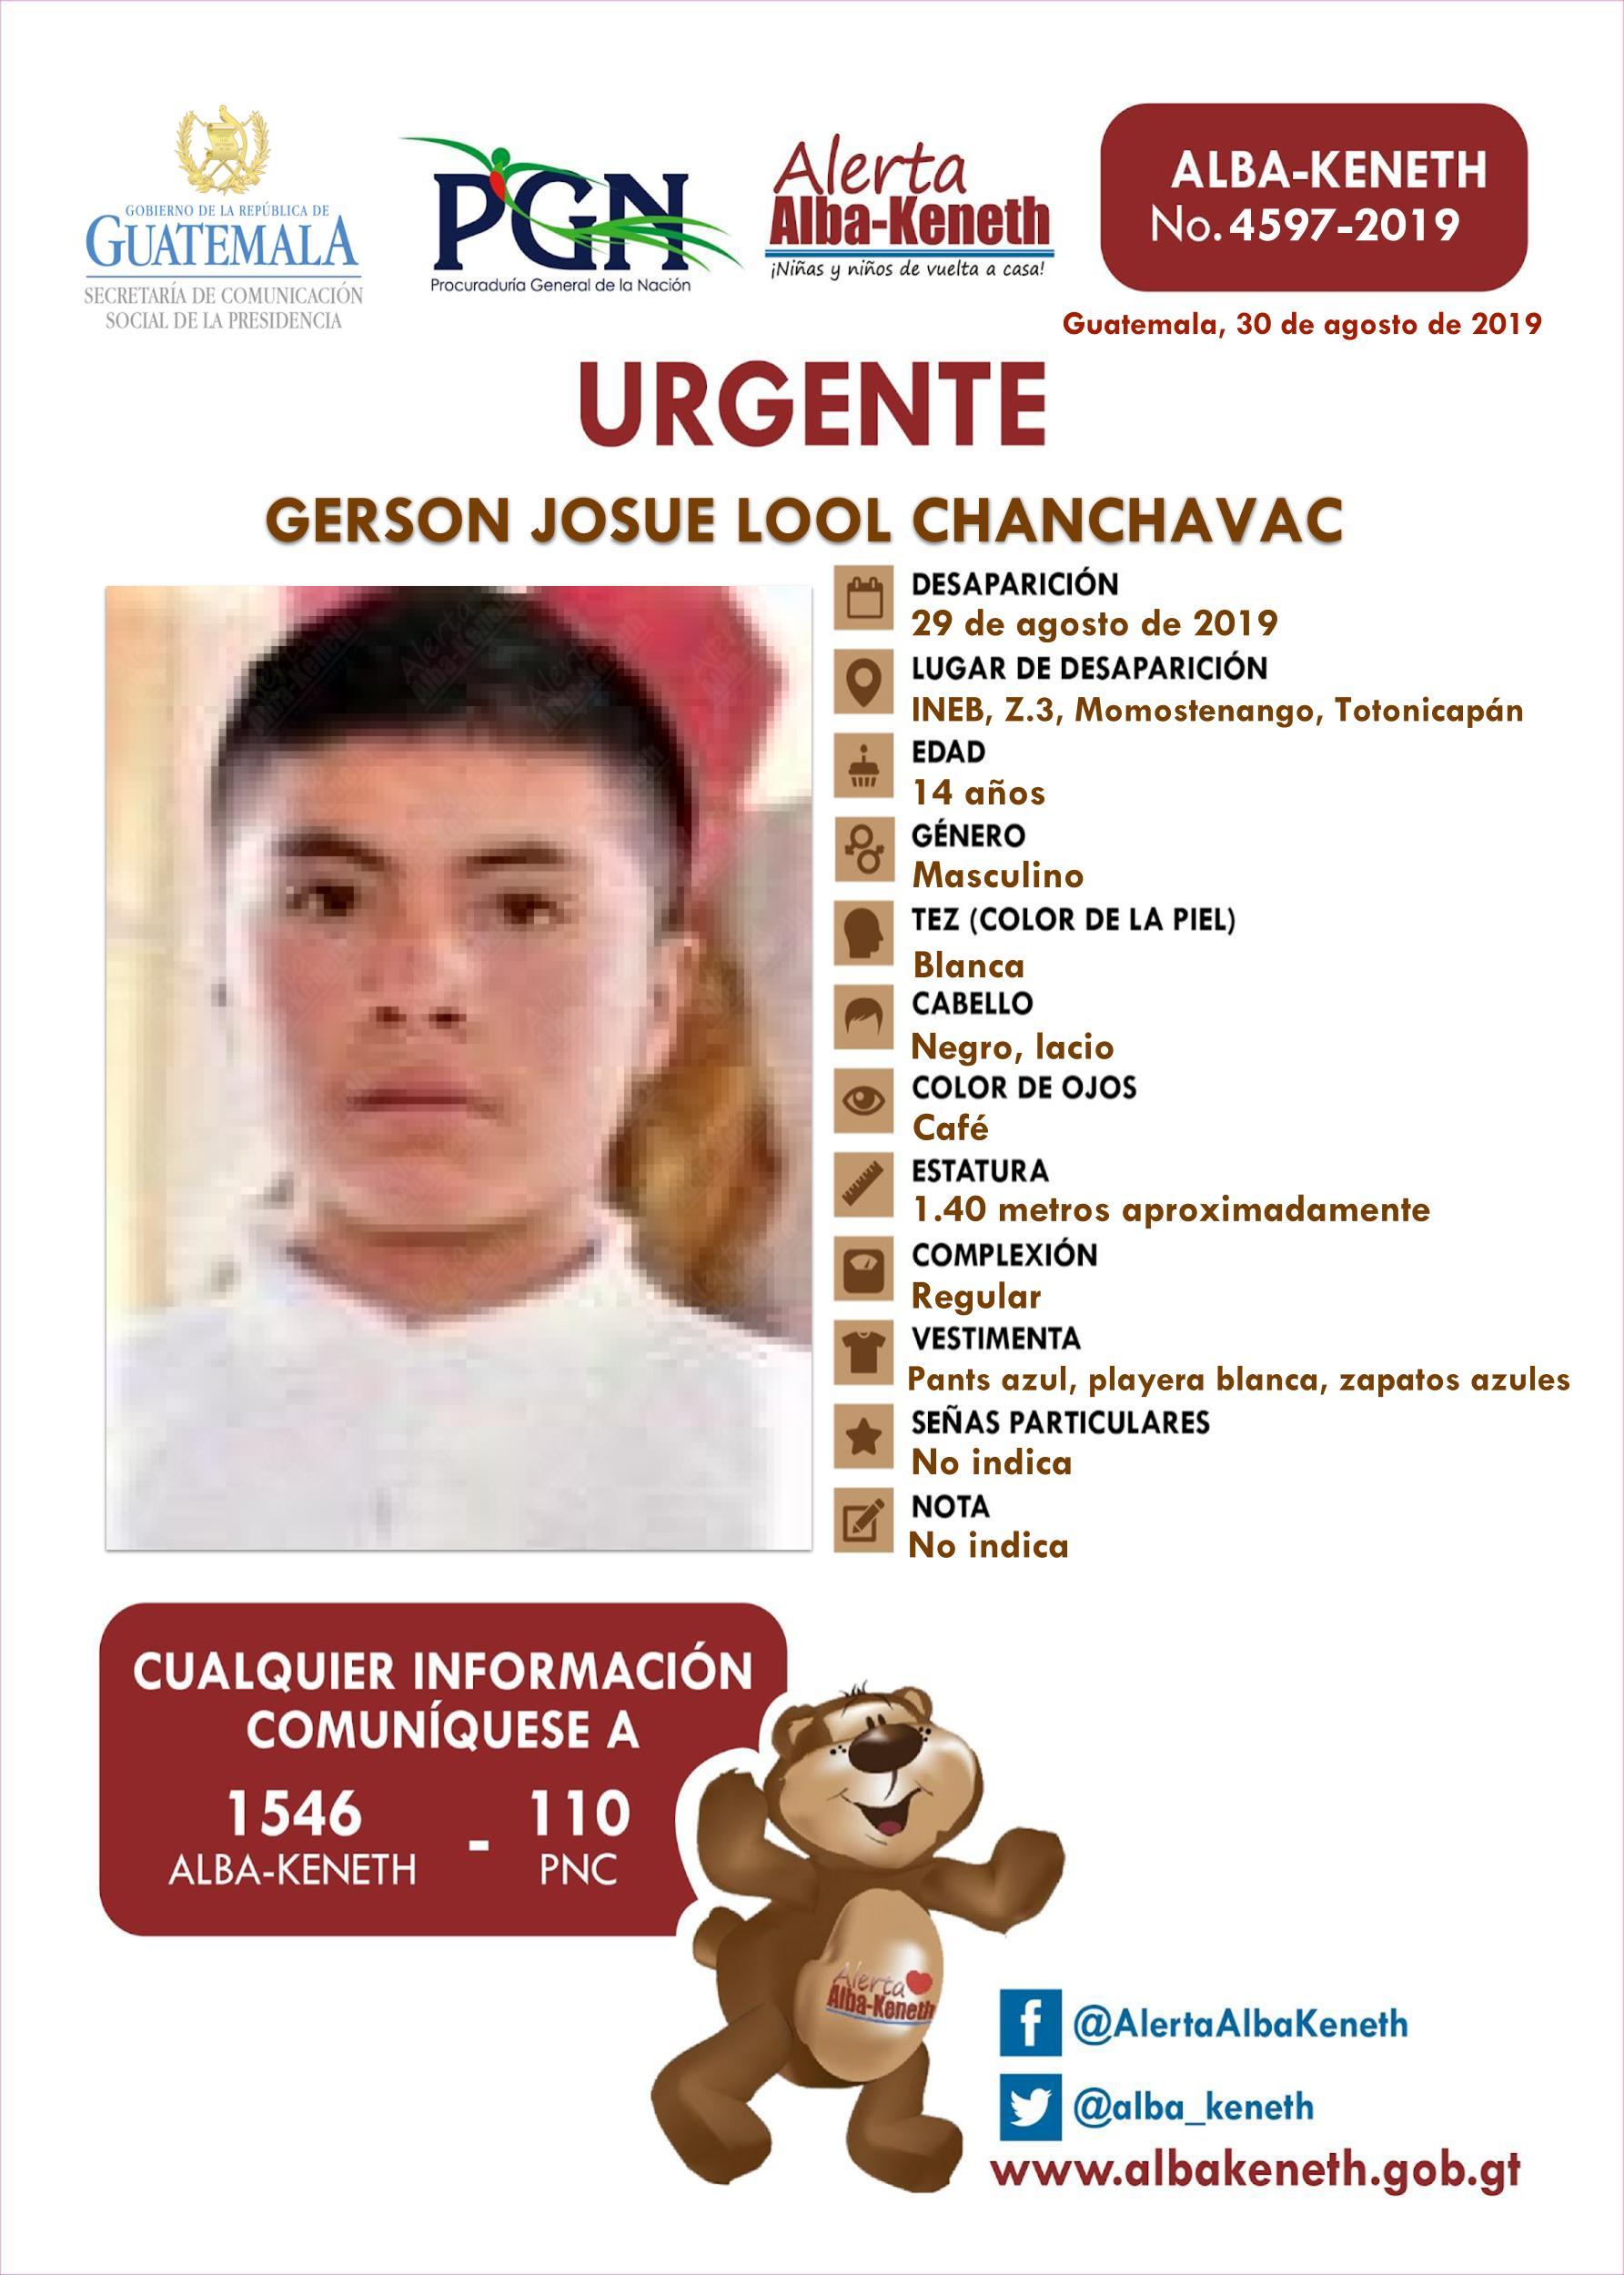 Gerson Josue Lool Chanchavac